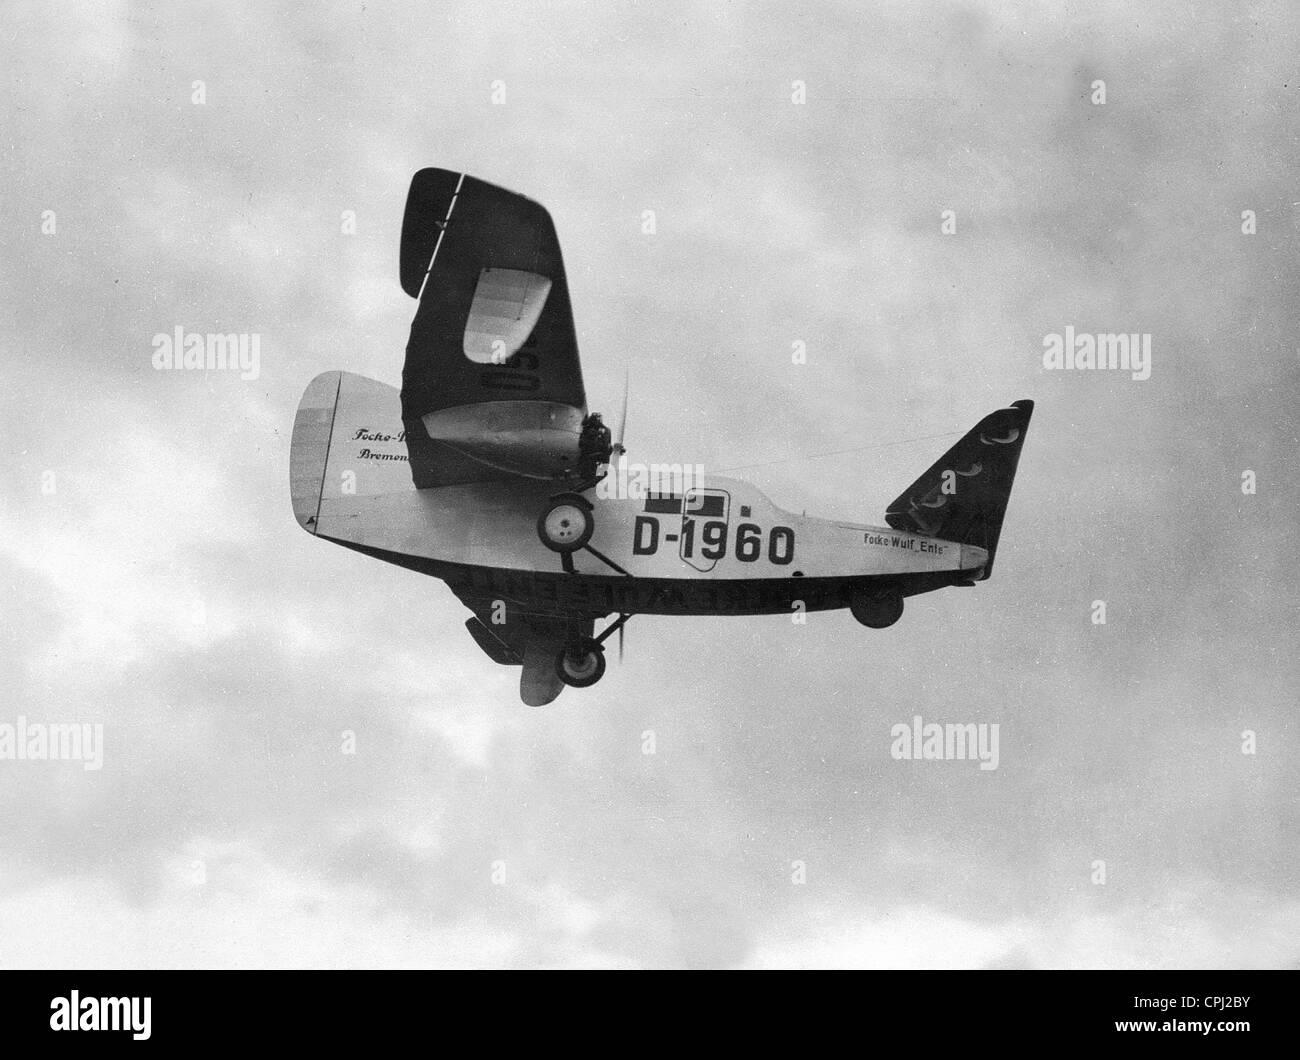 Focke Wulf F-19 'duck' - Stock Image